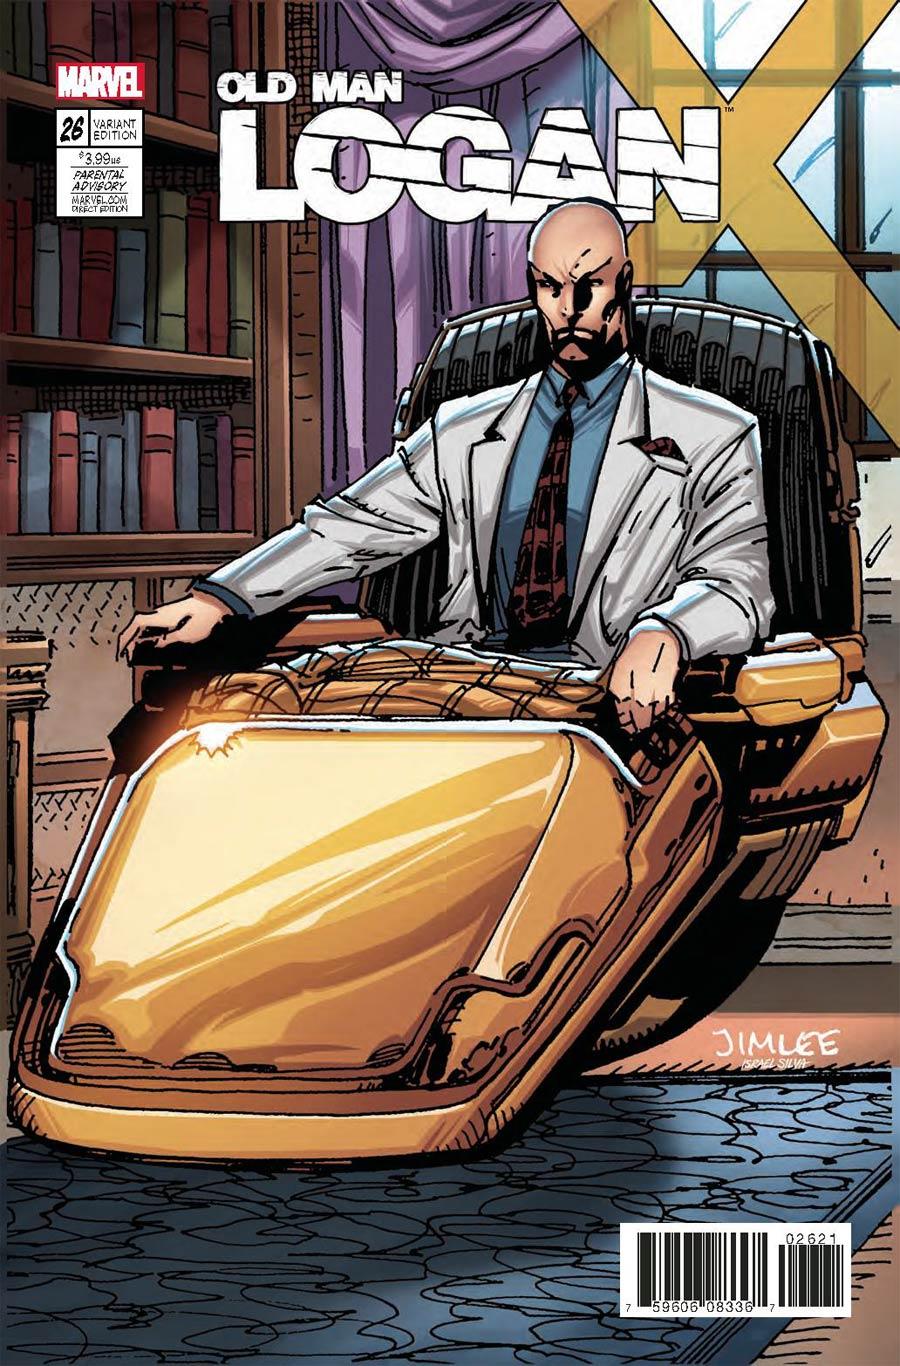 Old Man Logan Vol 2 #26 Cover B Variant Jim Lee X-Men Trading Card Cover